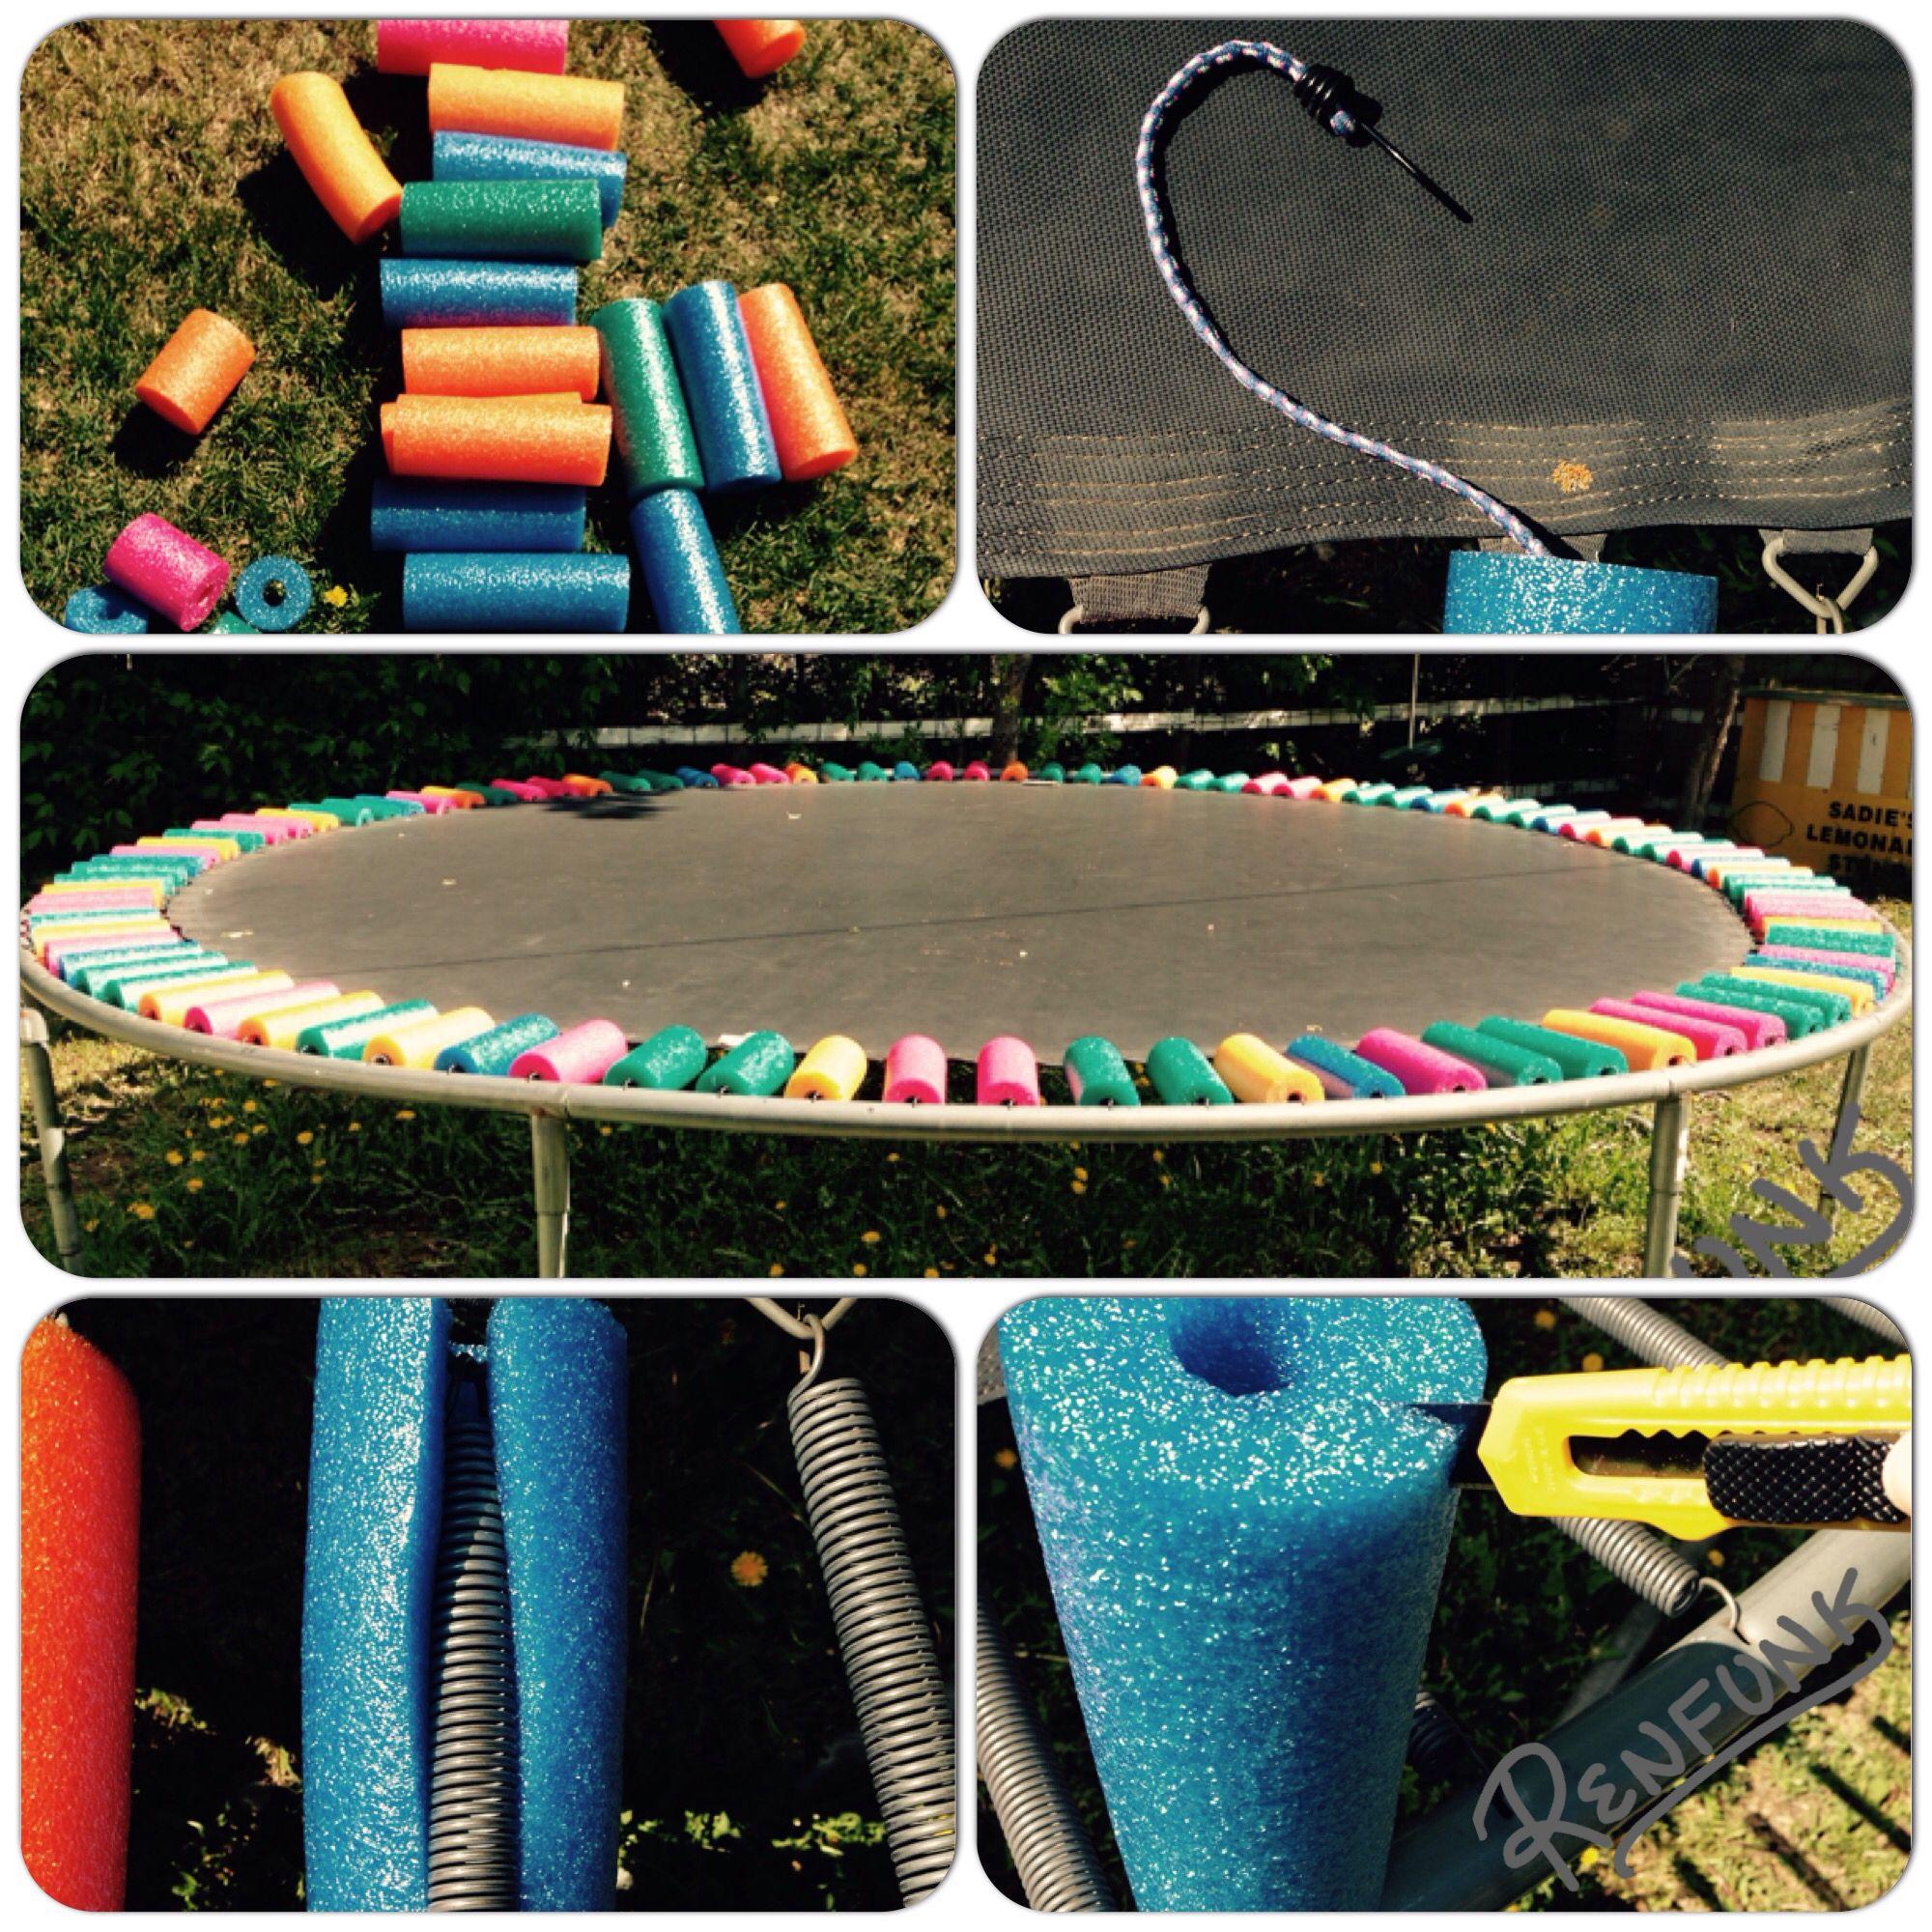 Getting Trampoline Springs Off: Pin By Rhonda Siery On Yard And Garden